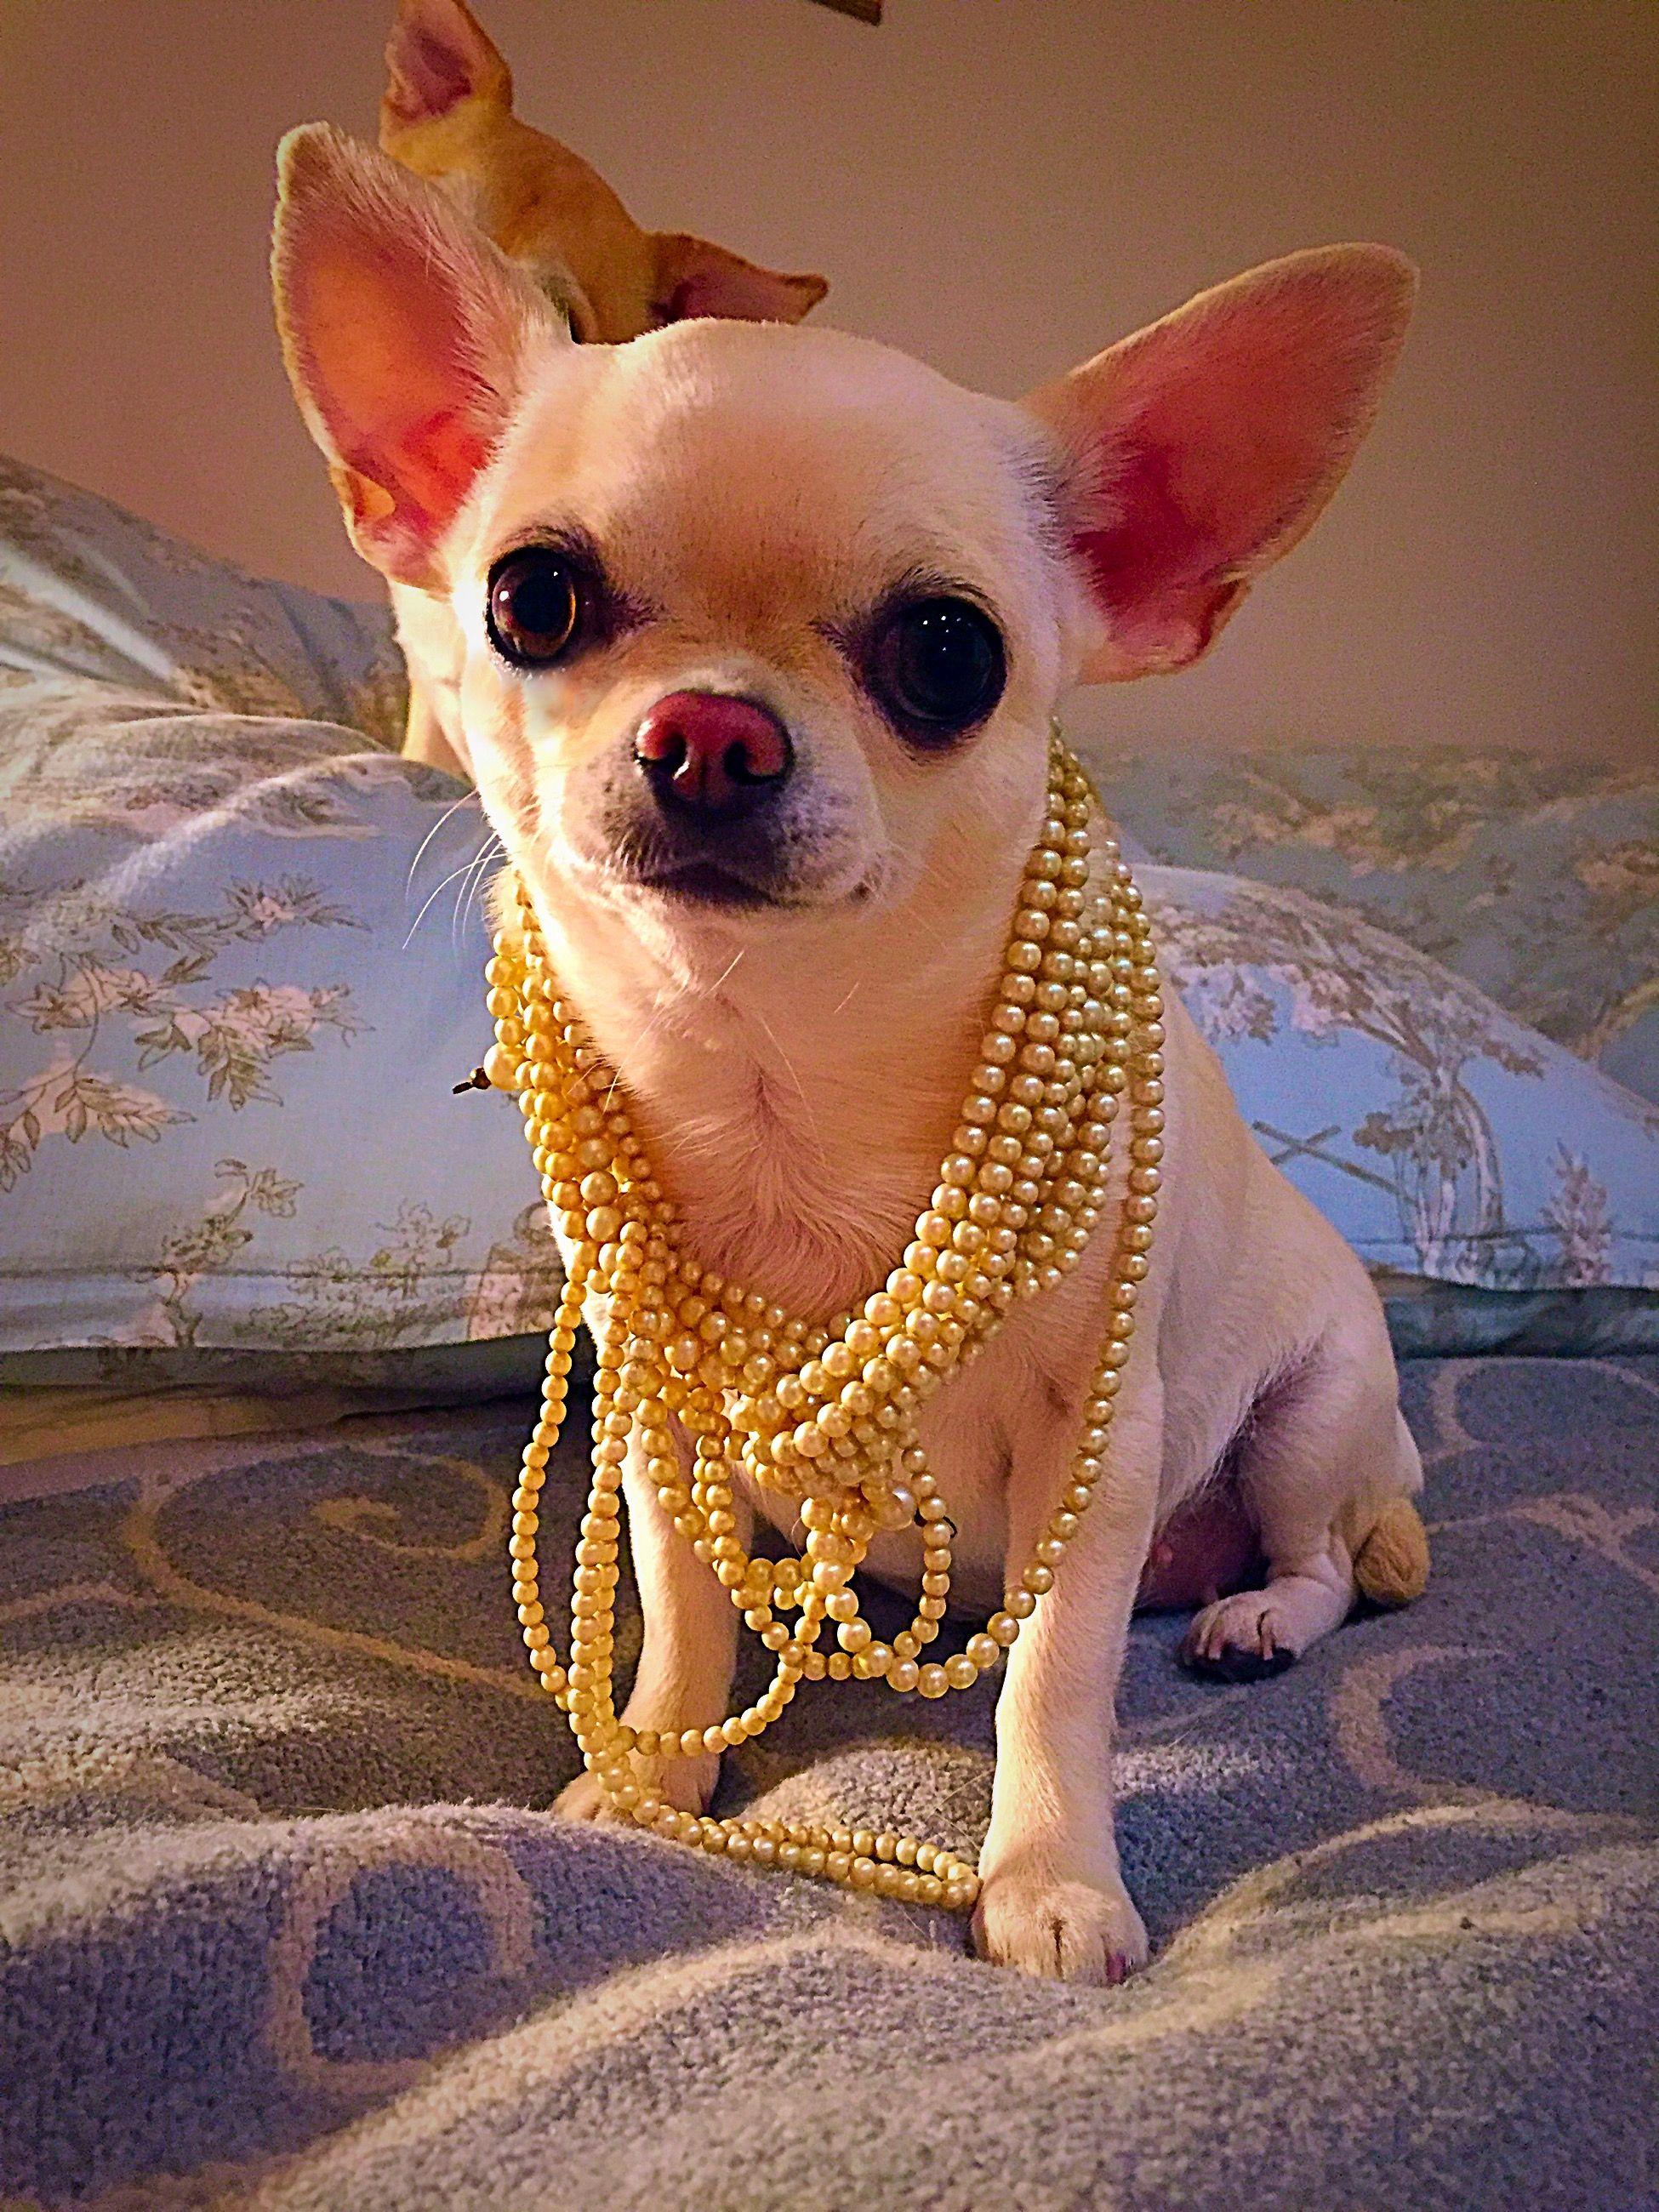 Pin By Kathy Verrone On Chihuahua Cuties Cute Chihuahua